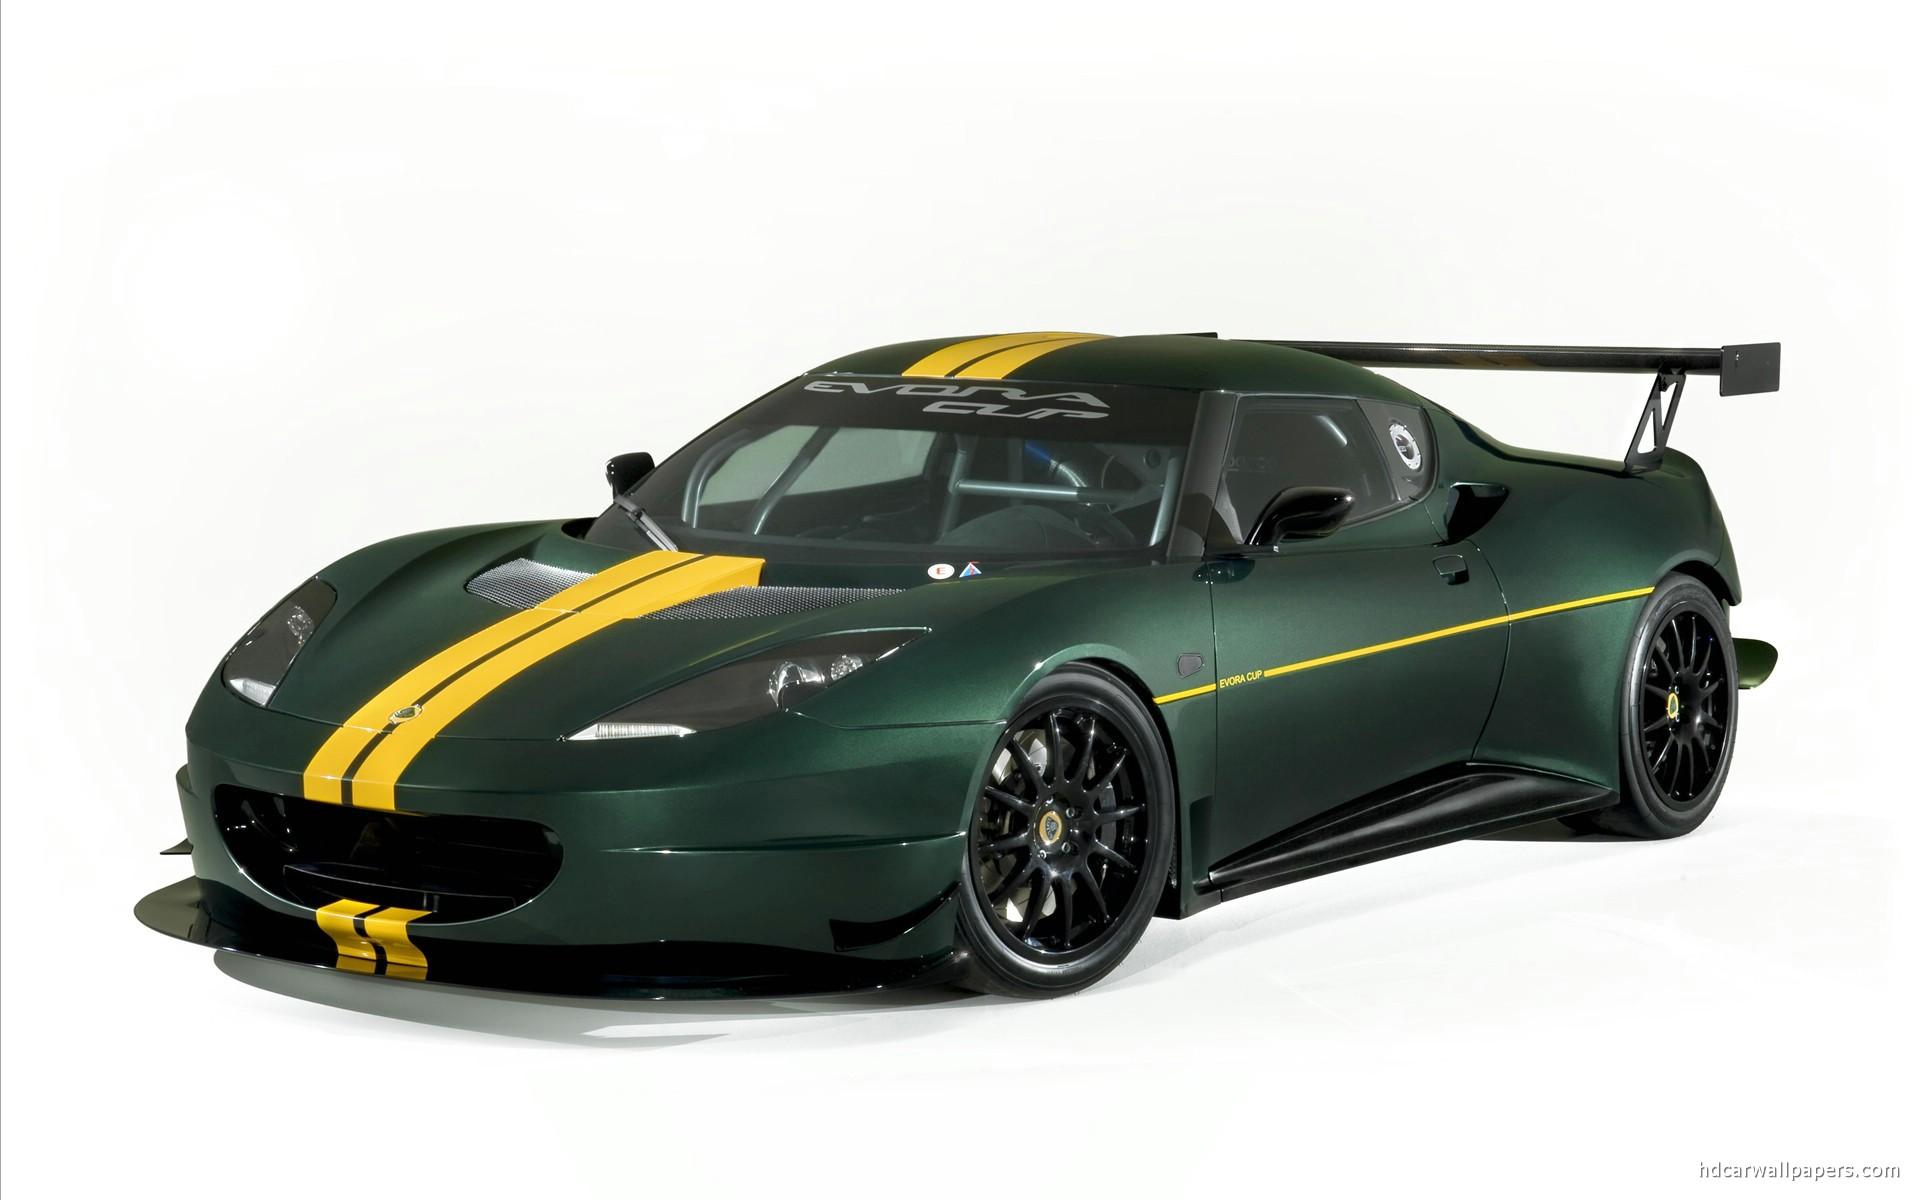 2010 Lotus Evora Cup Race Car Wallpaper  Hd Car